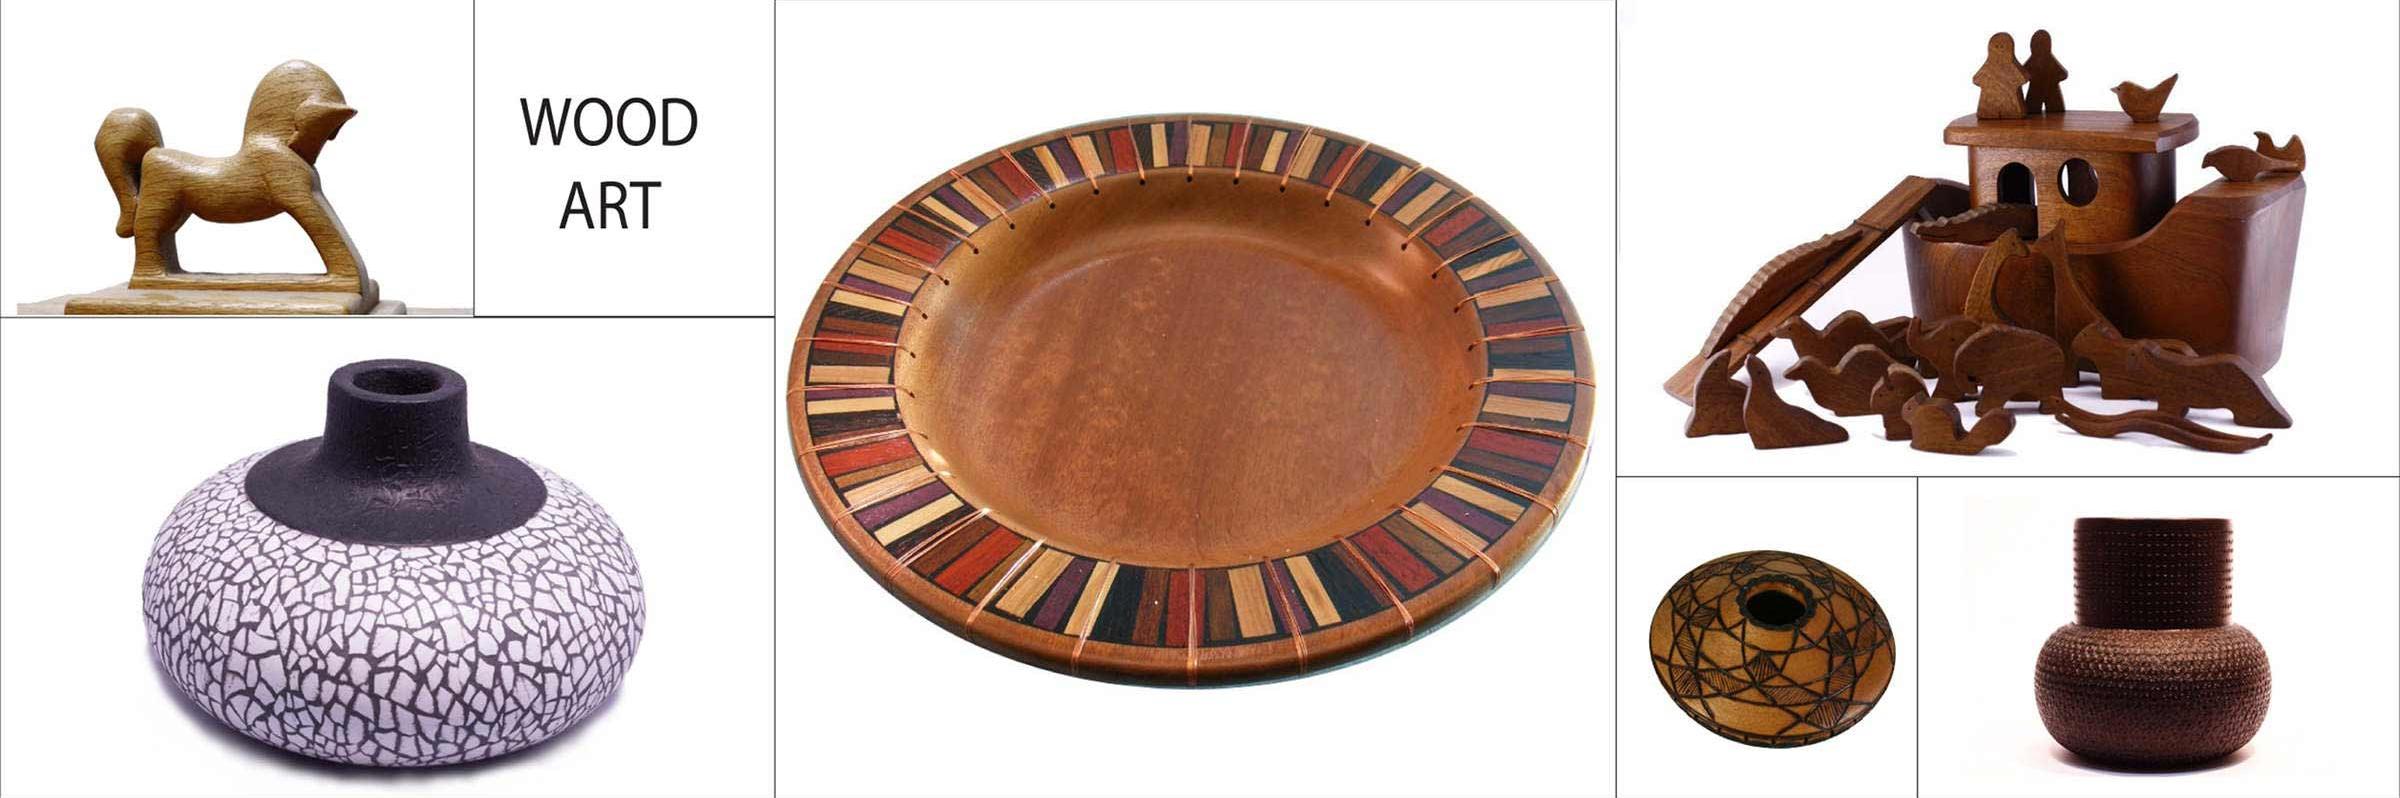 WoodArtBannerSmall-Etz-Ron-Handcrafted-Wooden-Judaica-Home-Decor-Handmade-Jewelry-Website_banner-1S_black-01-RW-2400-800_opt